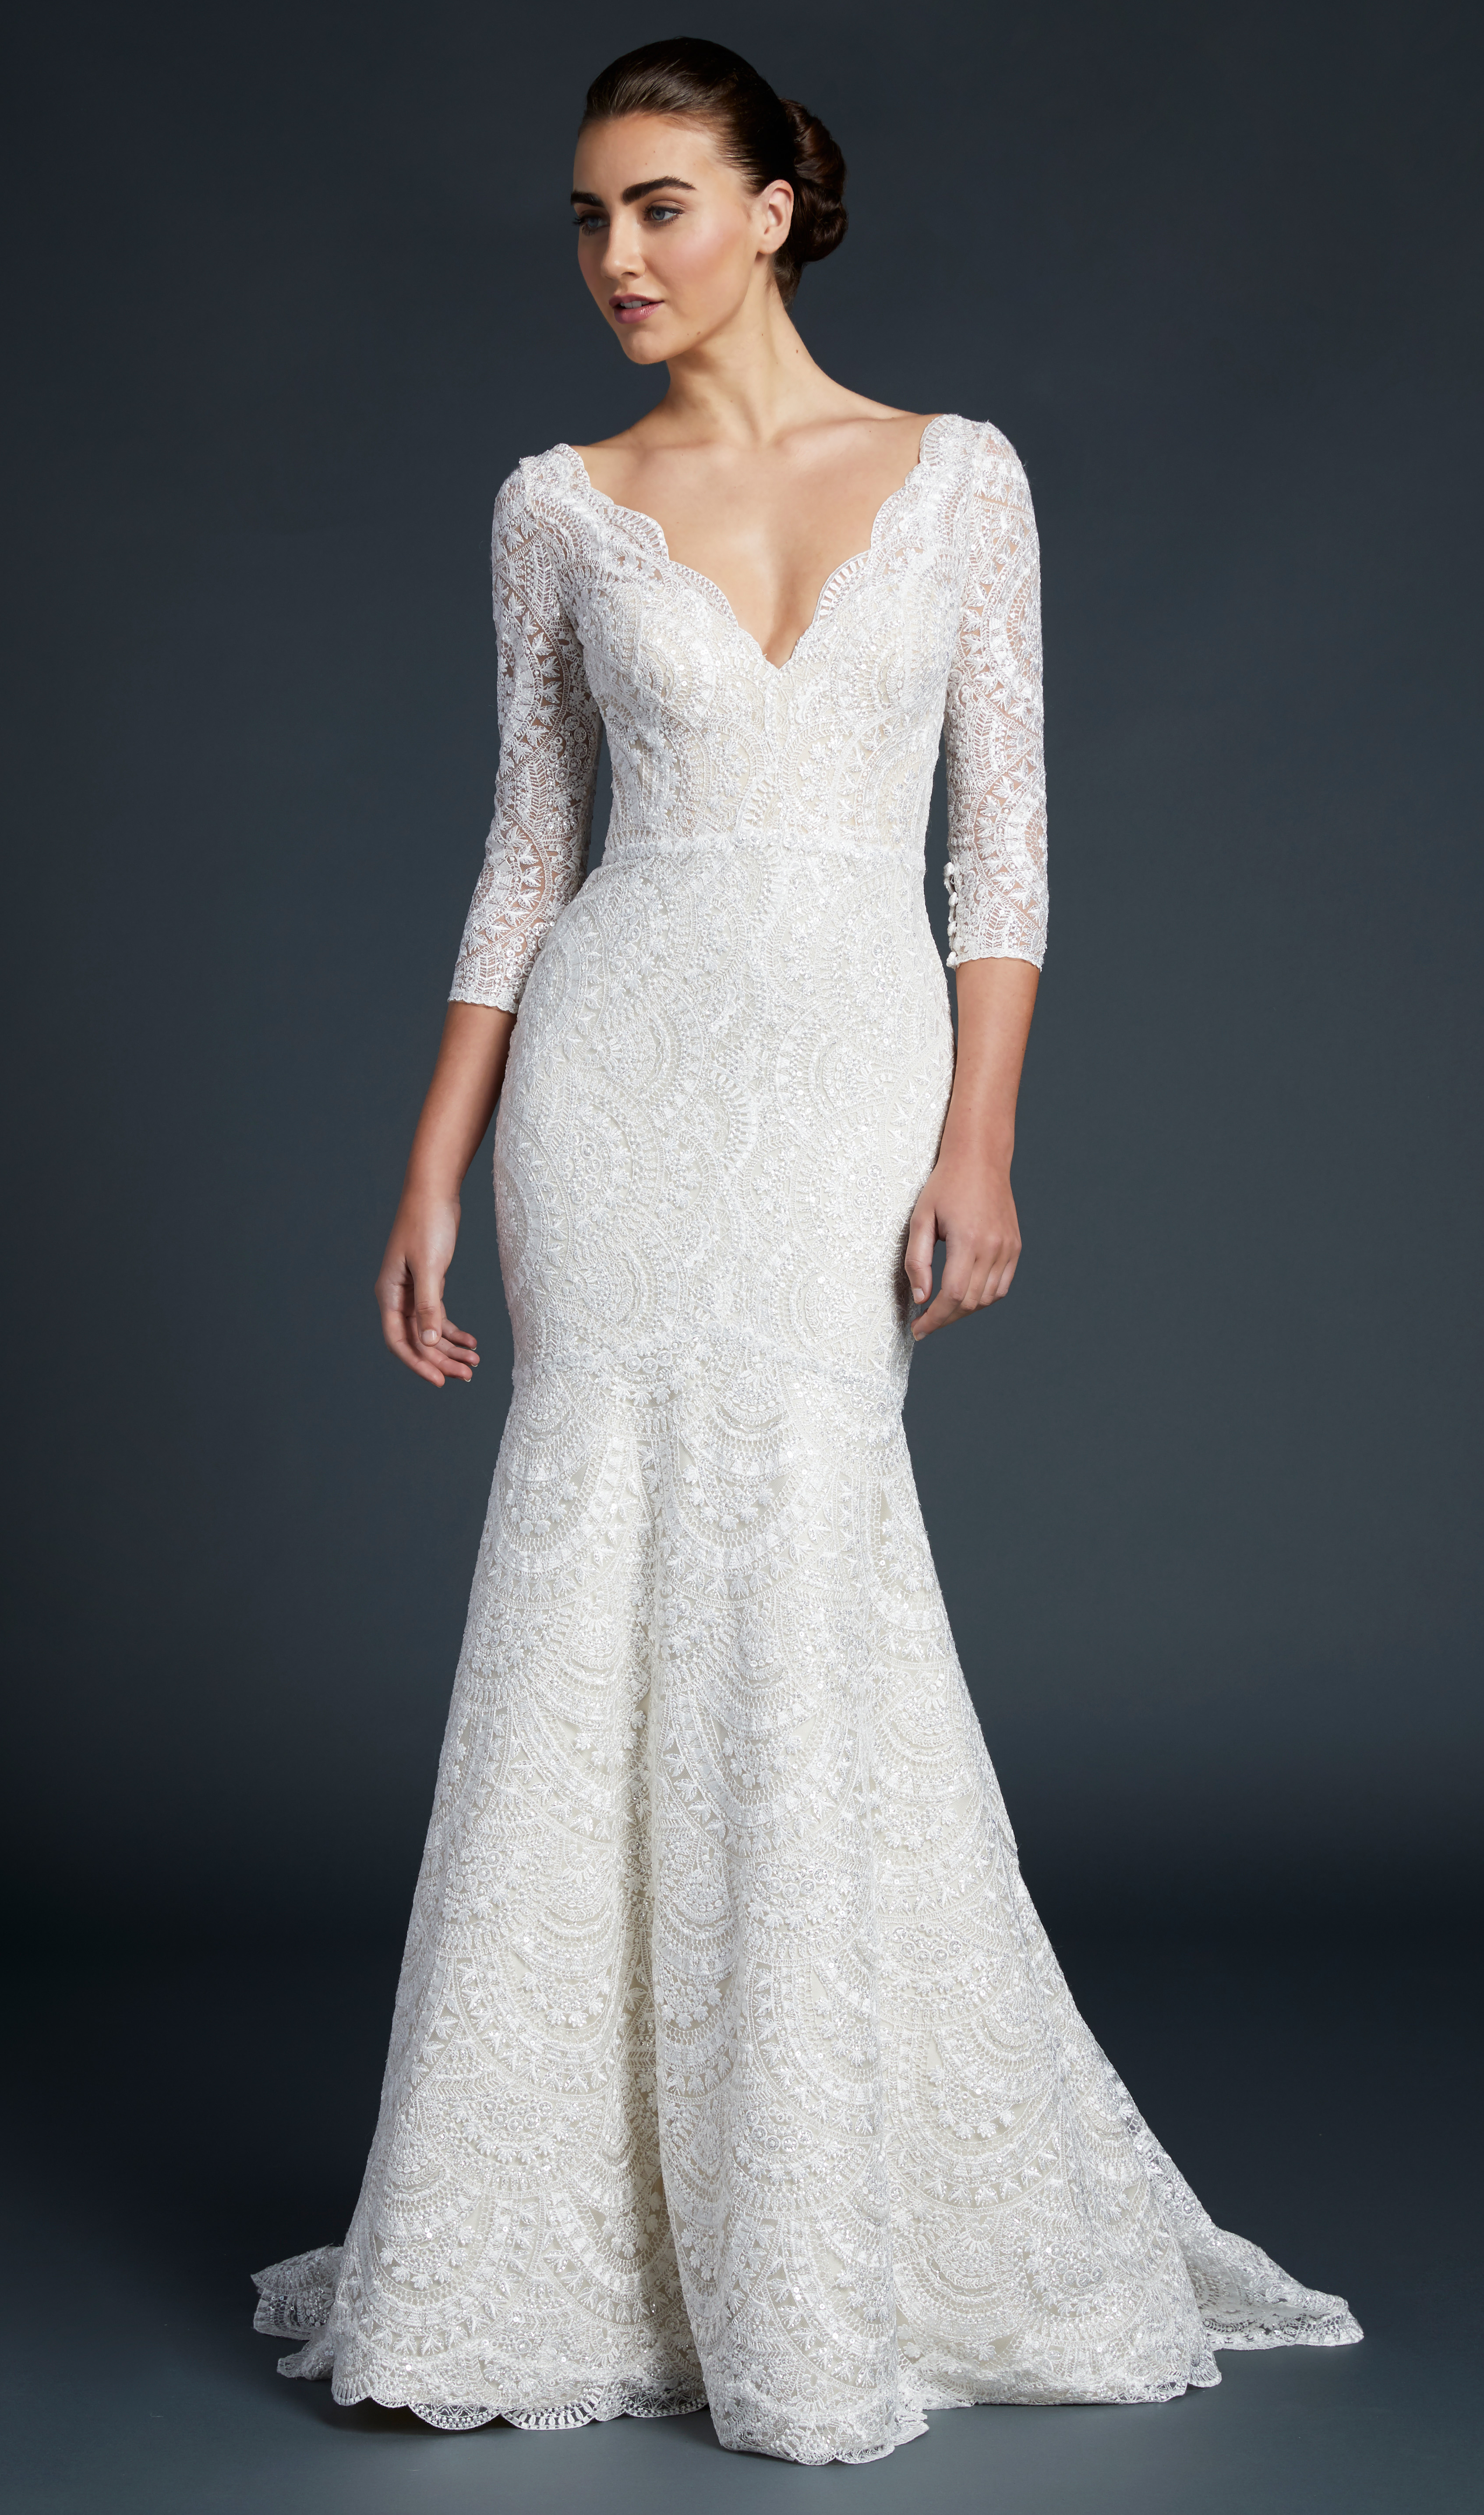 blue willow wedding dress three-quarter length sleeves lace v-neck trumpet